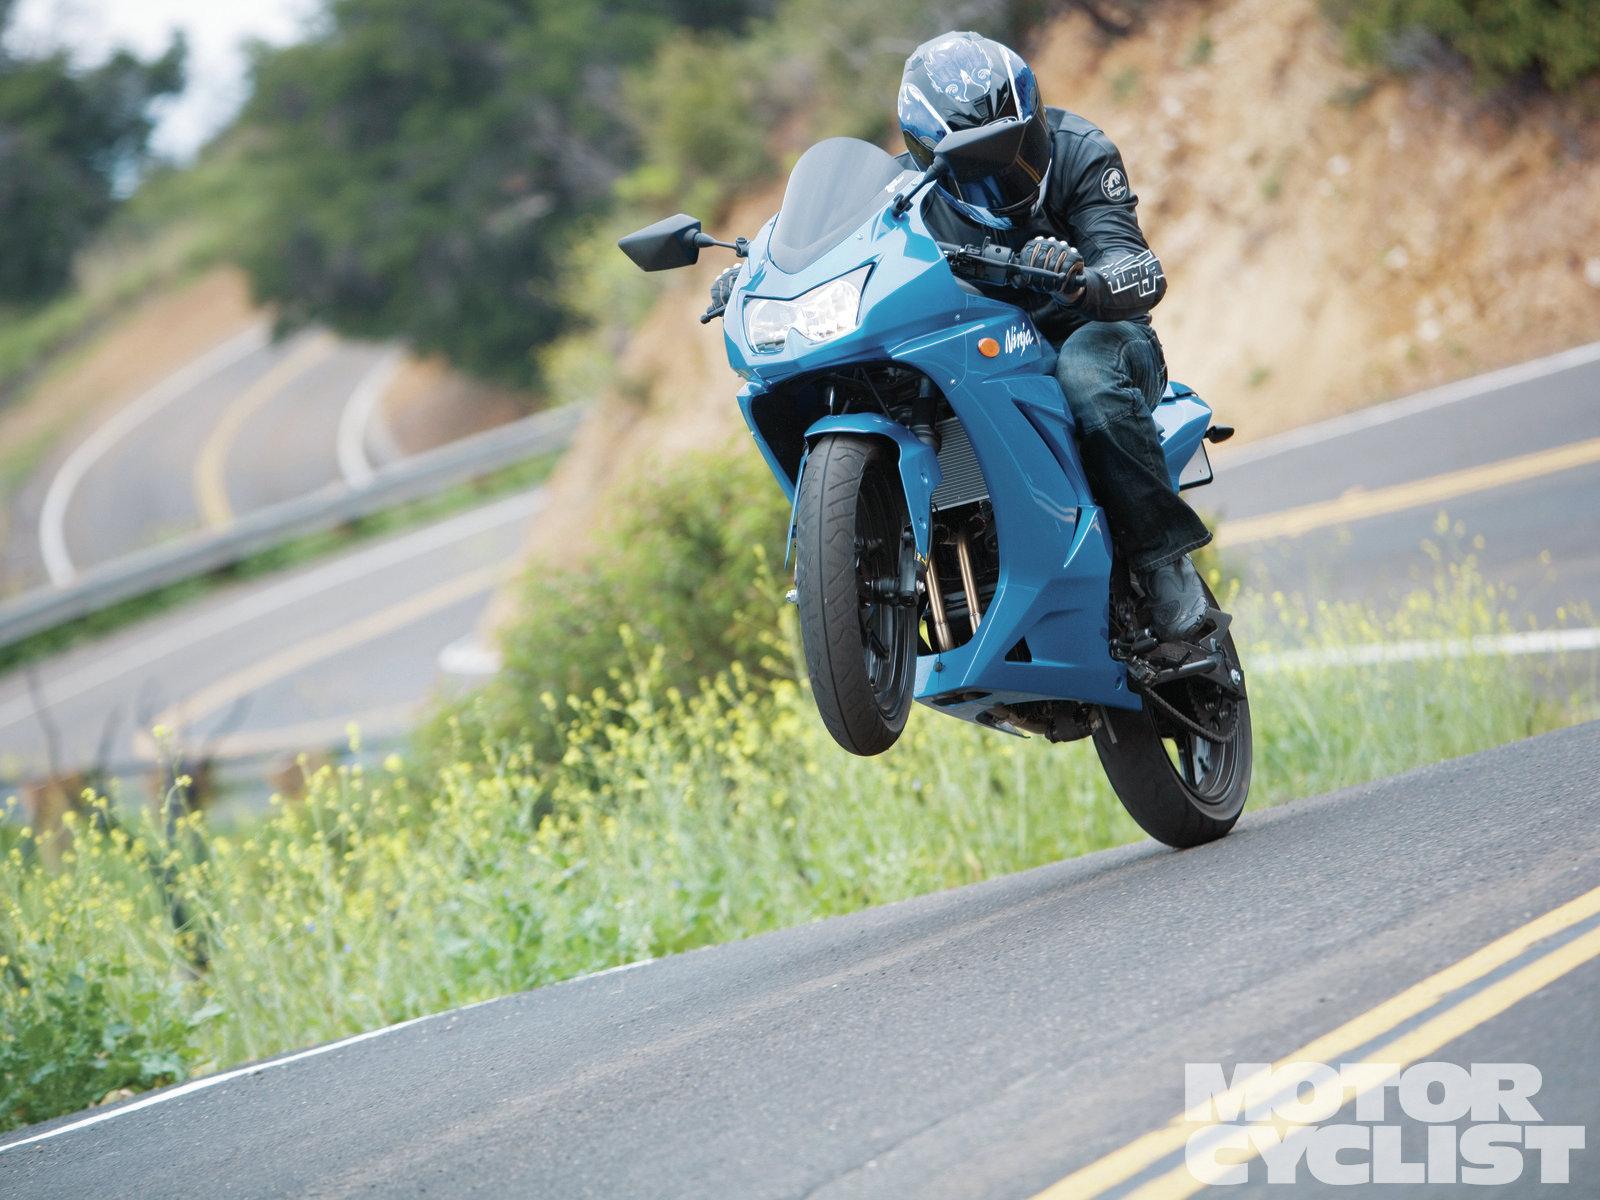 Kawasaki Ninja 250R: $1500 Streetbike Surgery | Motorcyclist